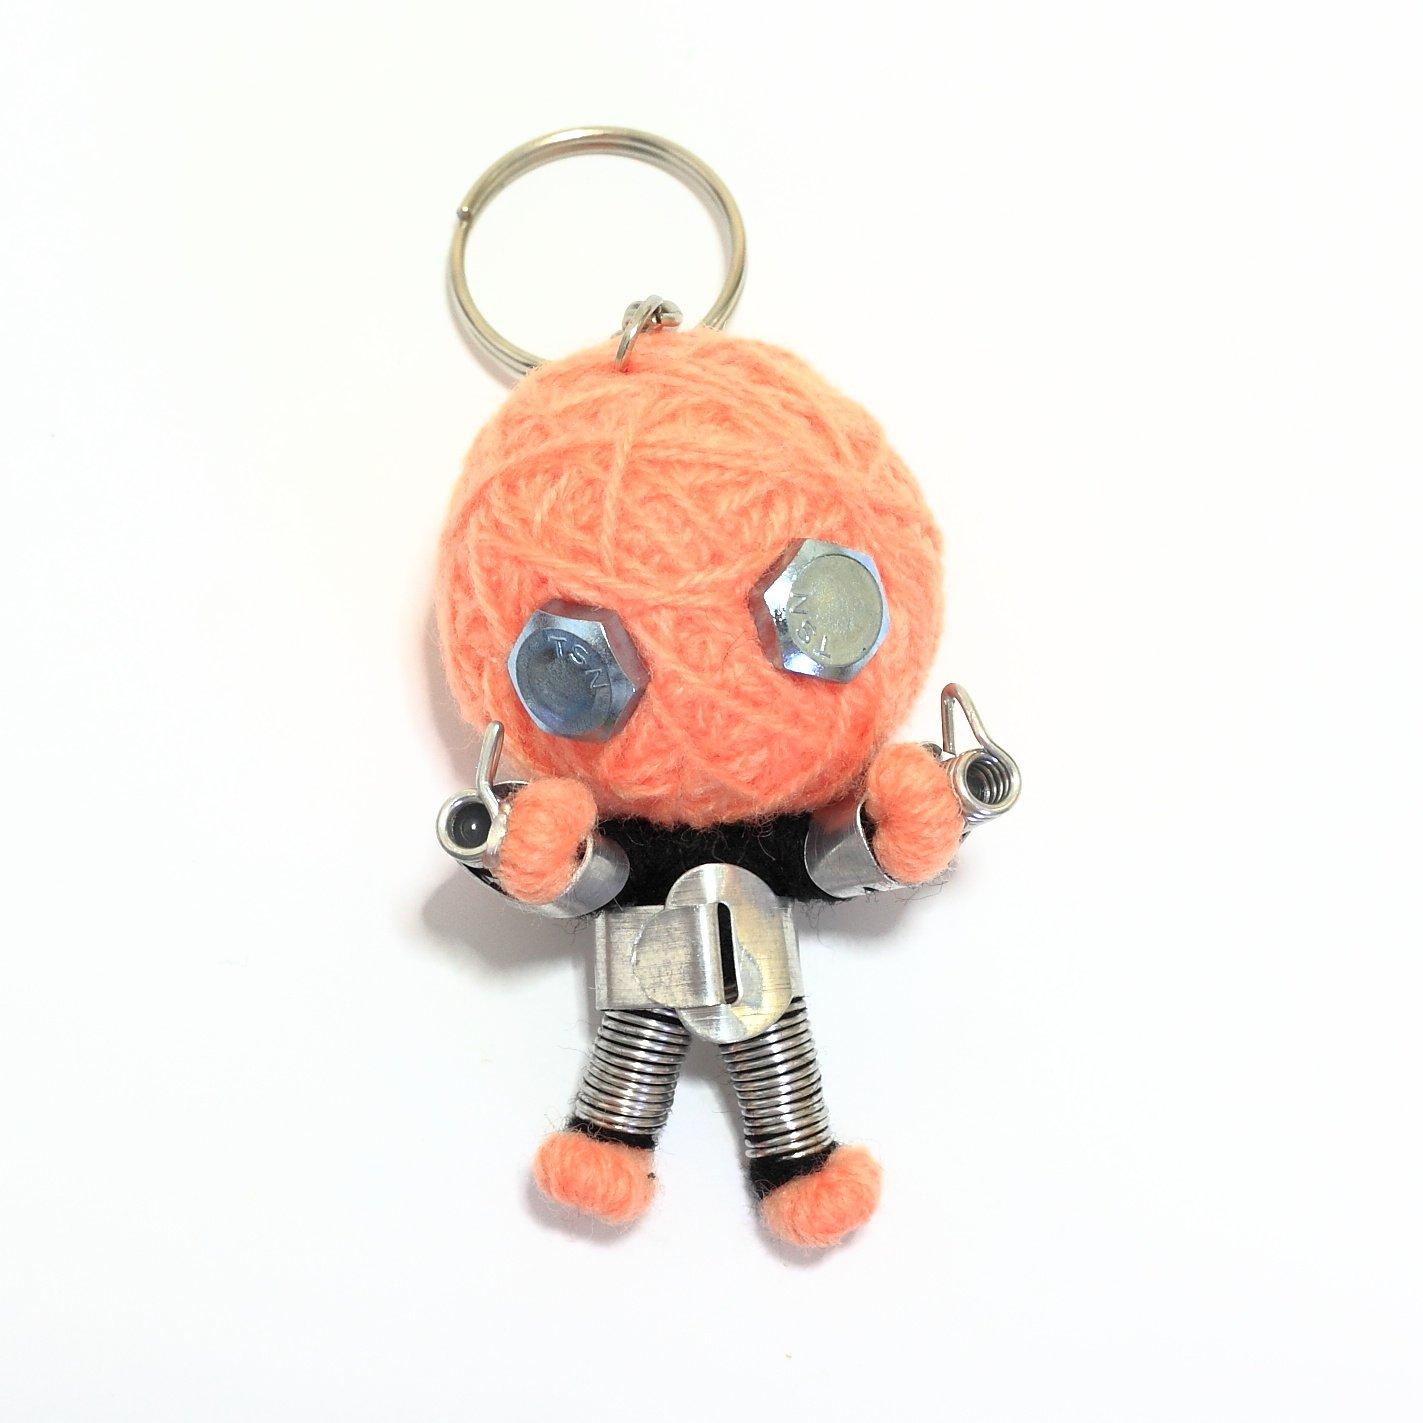 Purple Color Iron Man Voodoo Doll Keyring Keychain